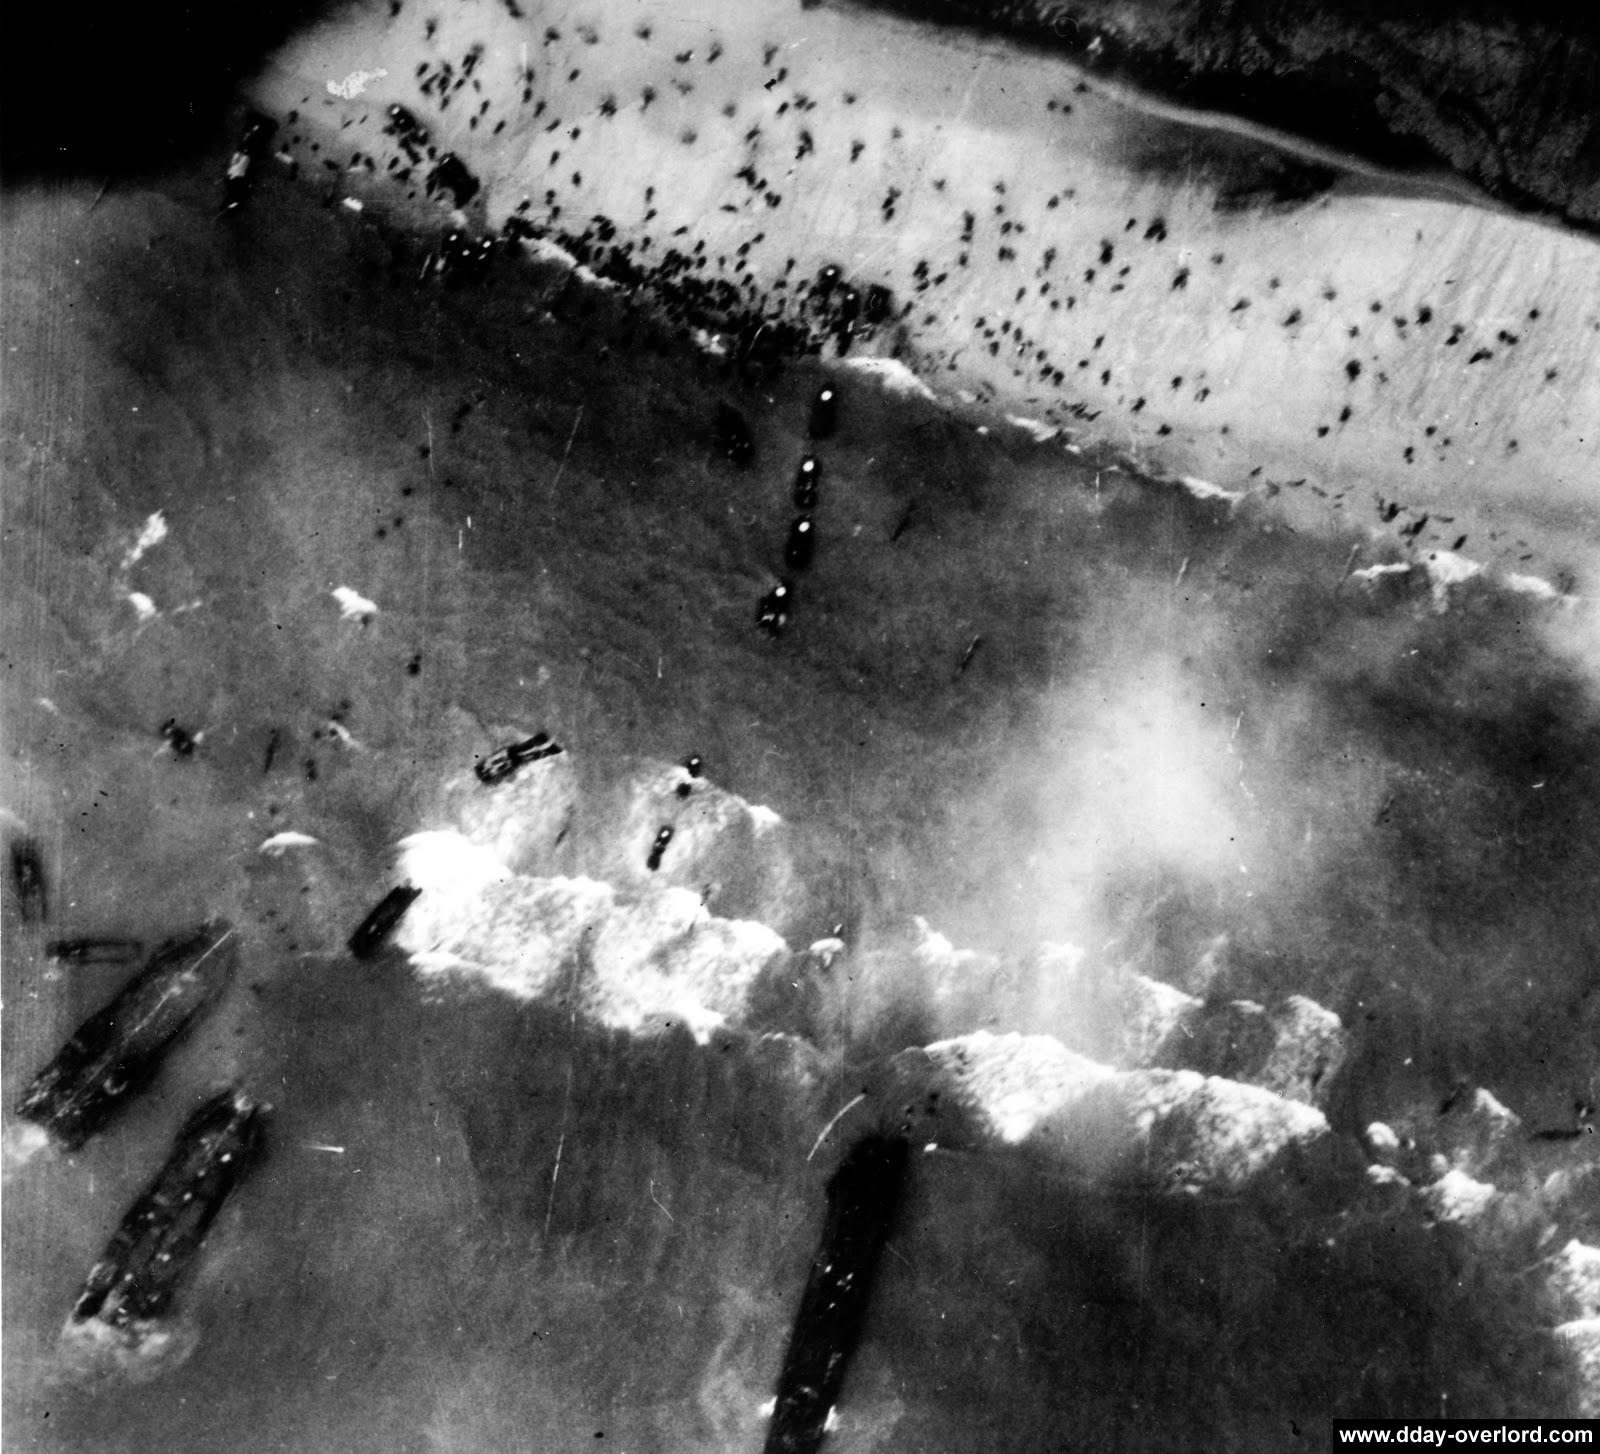 Essay On D-Day Invasion